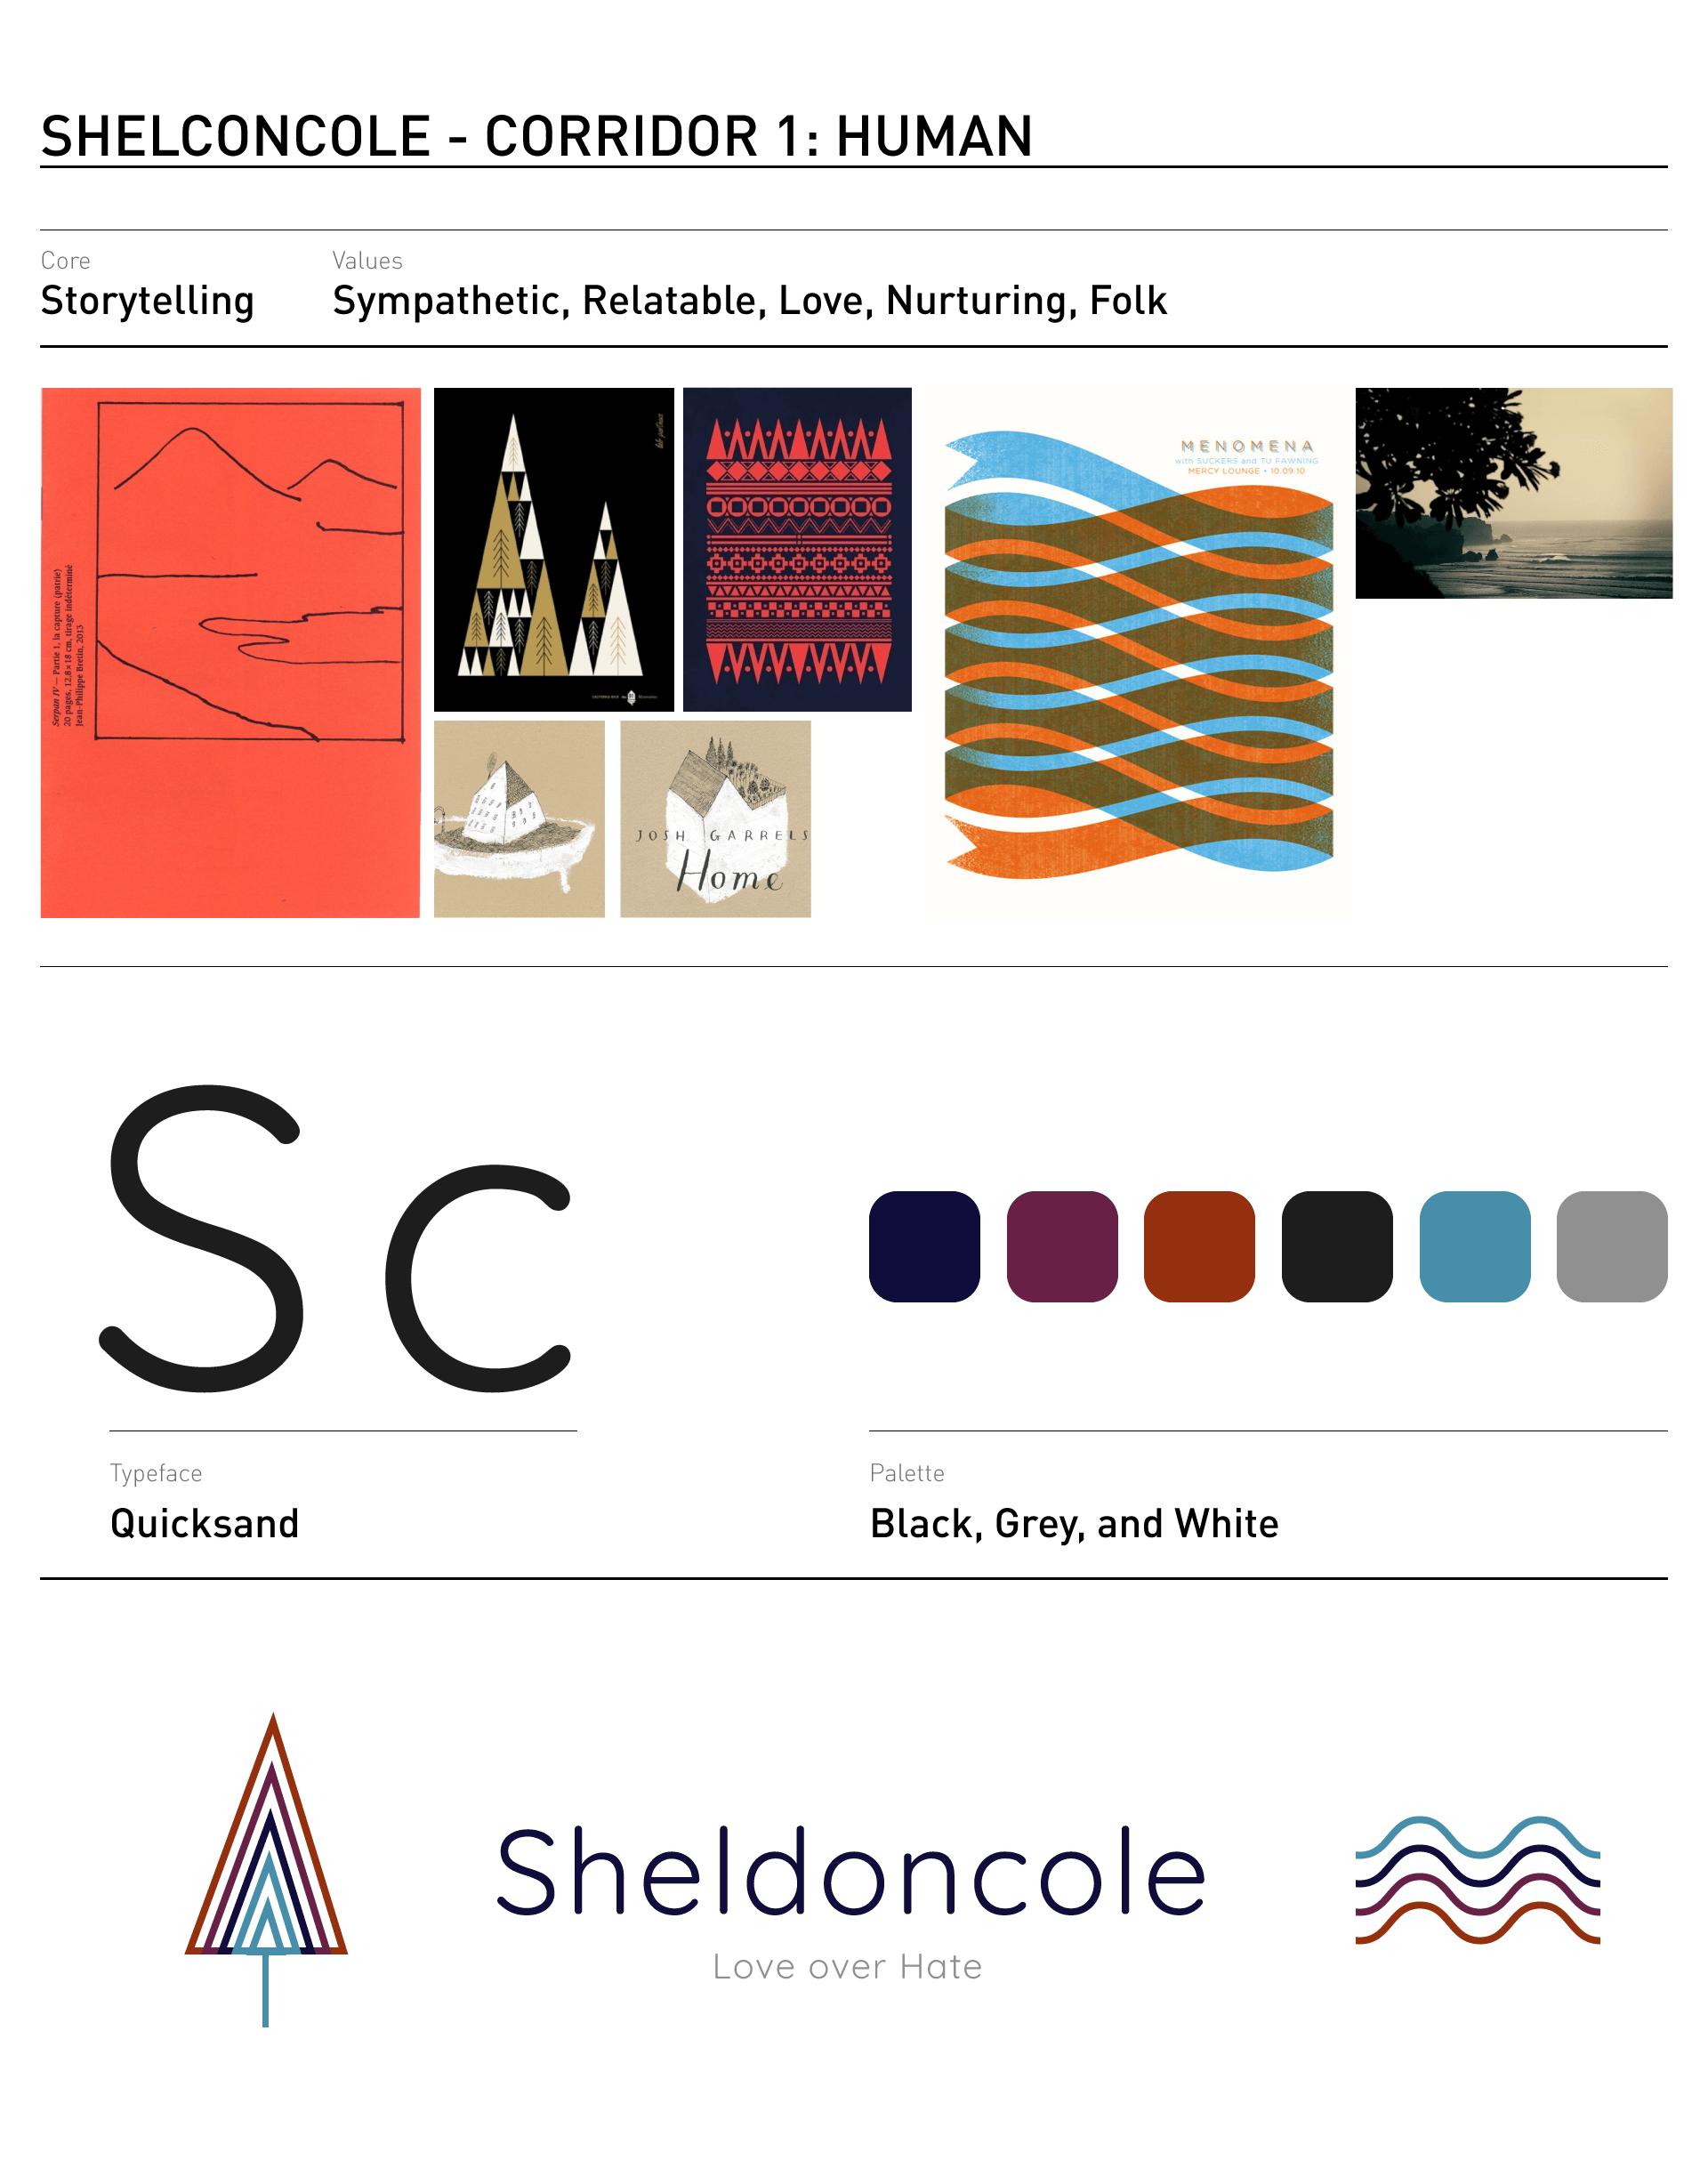 sheldoncole_corridorsA_human-tiny.png